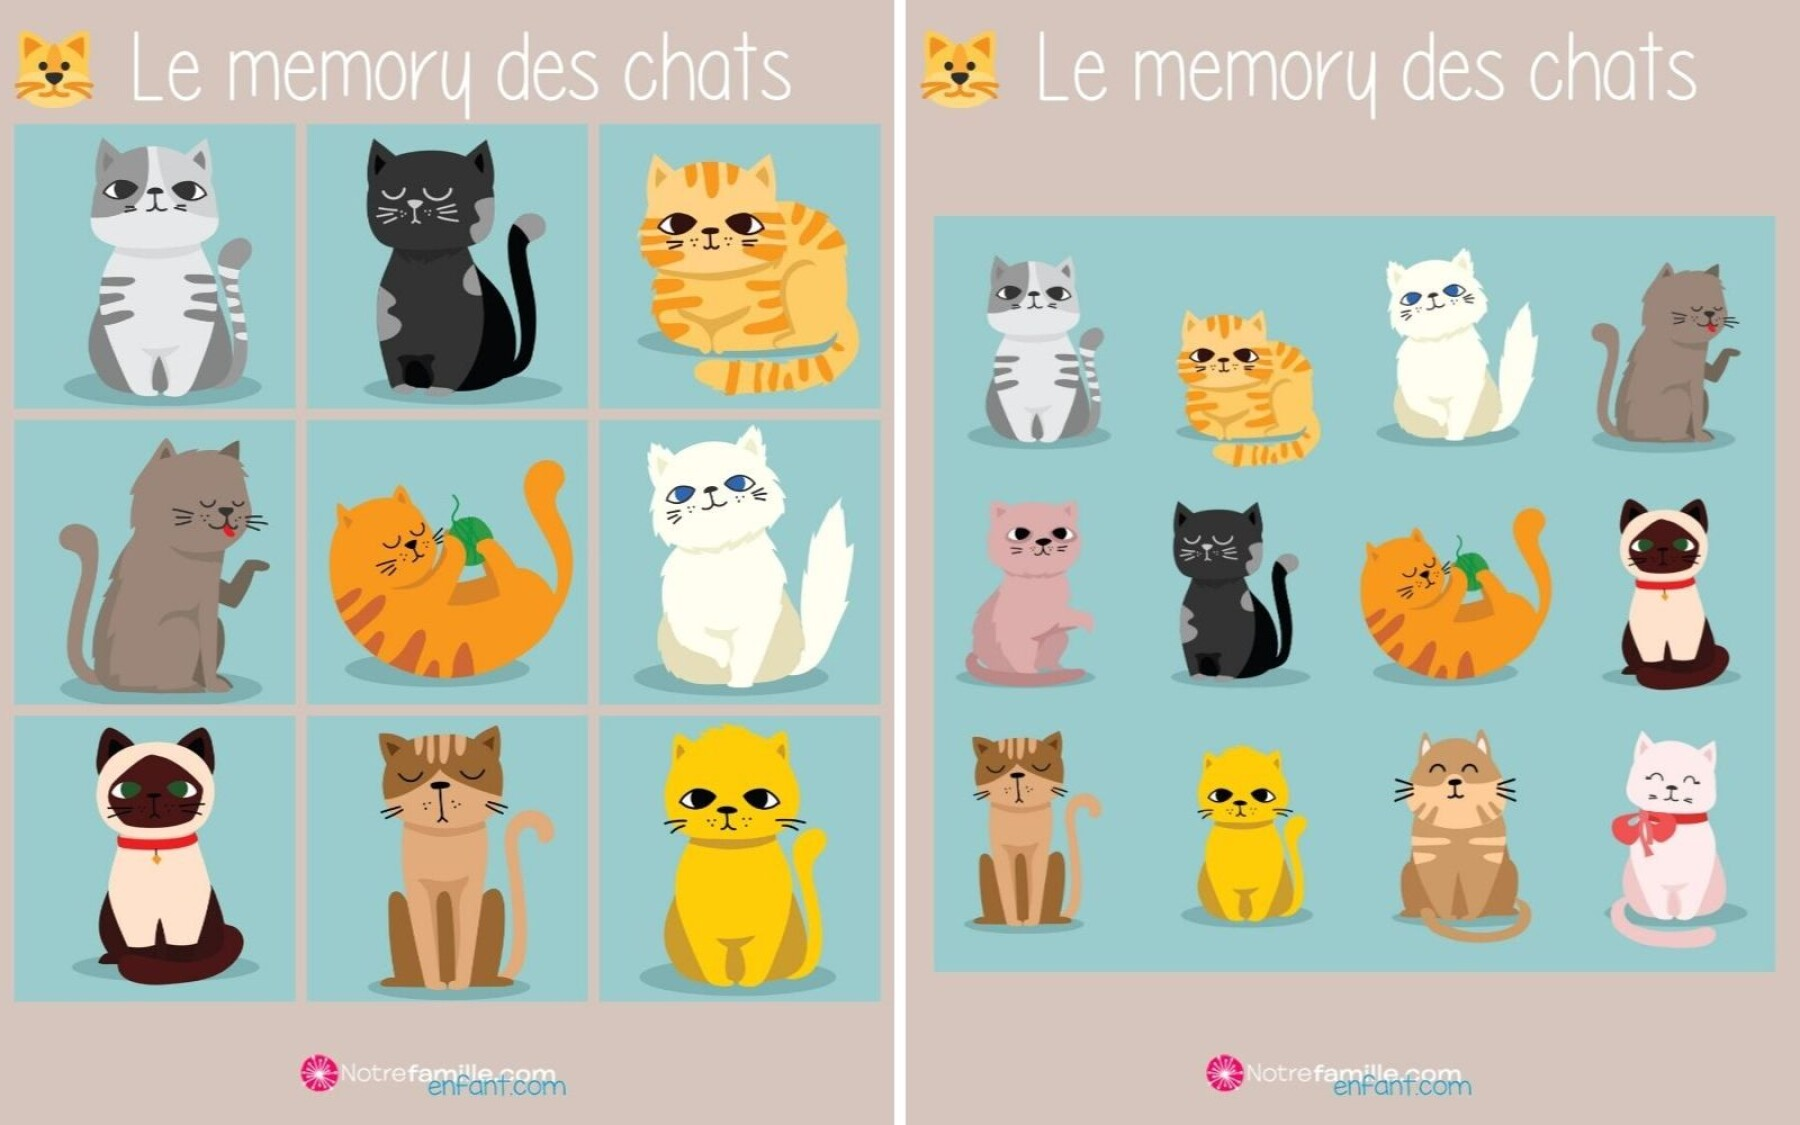 Memory des chats